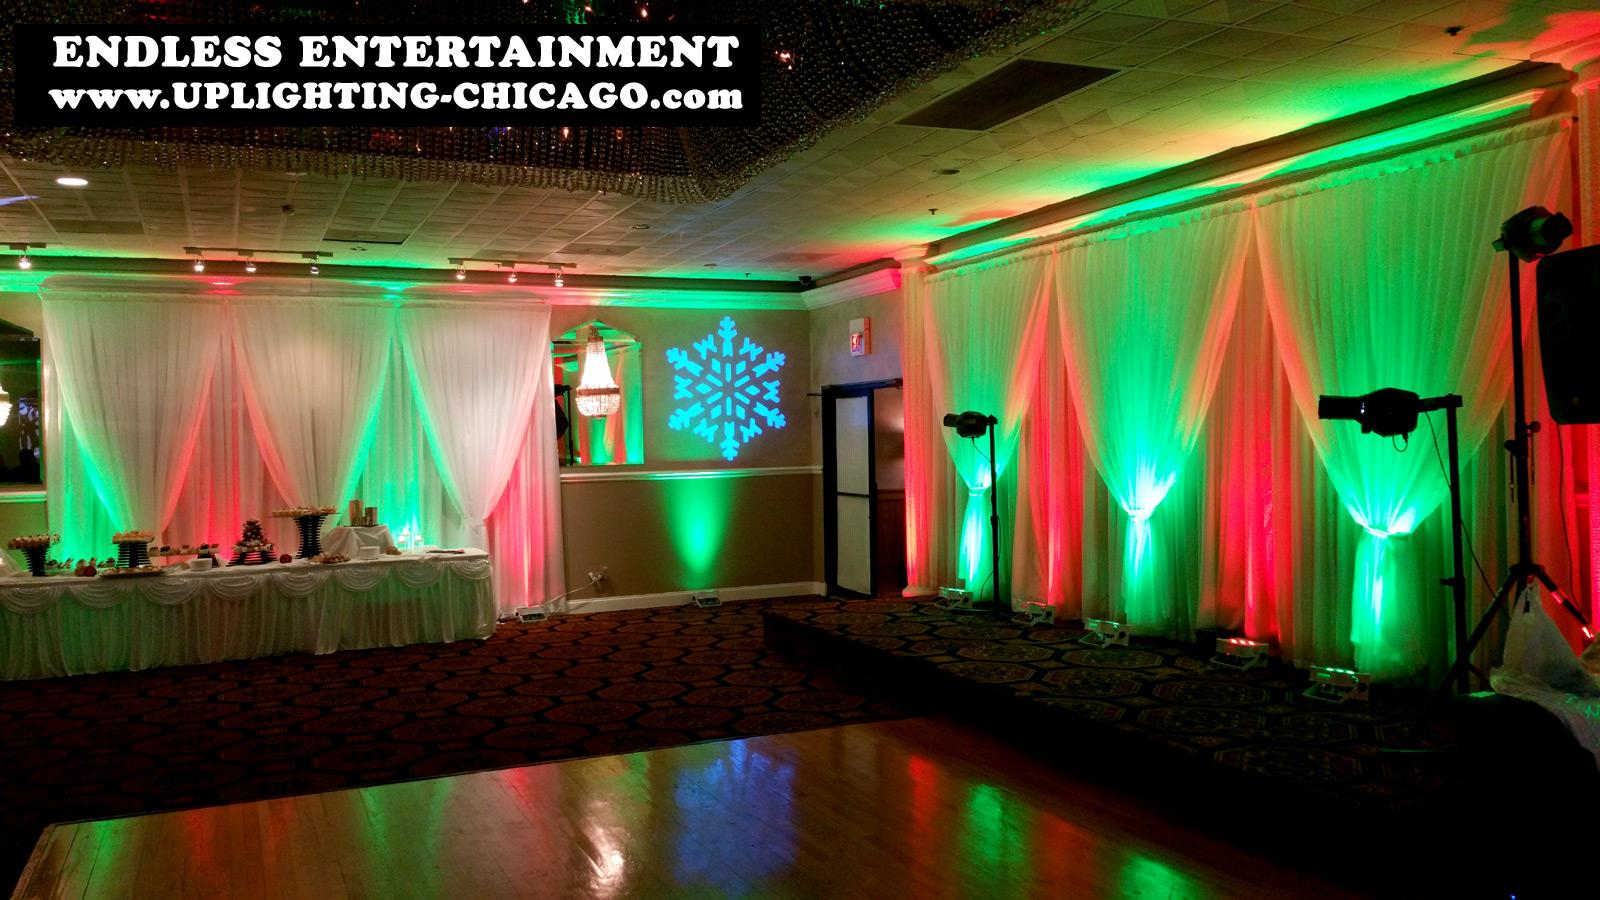 Green Christmas Uplighting rental